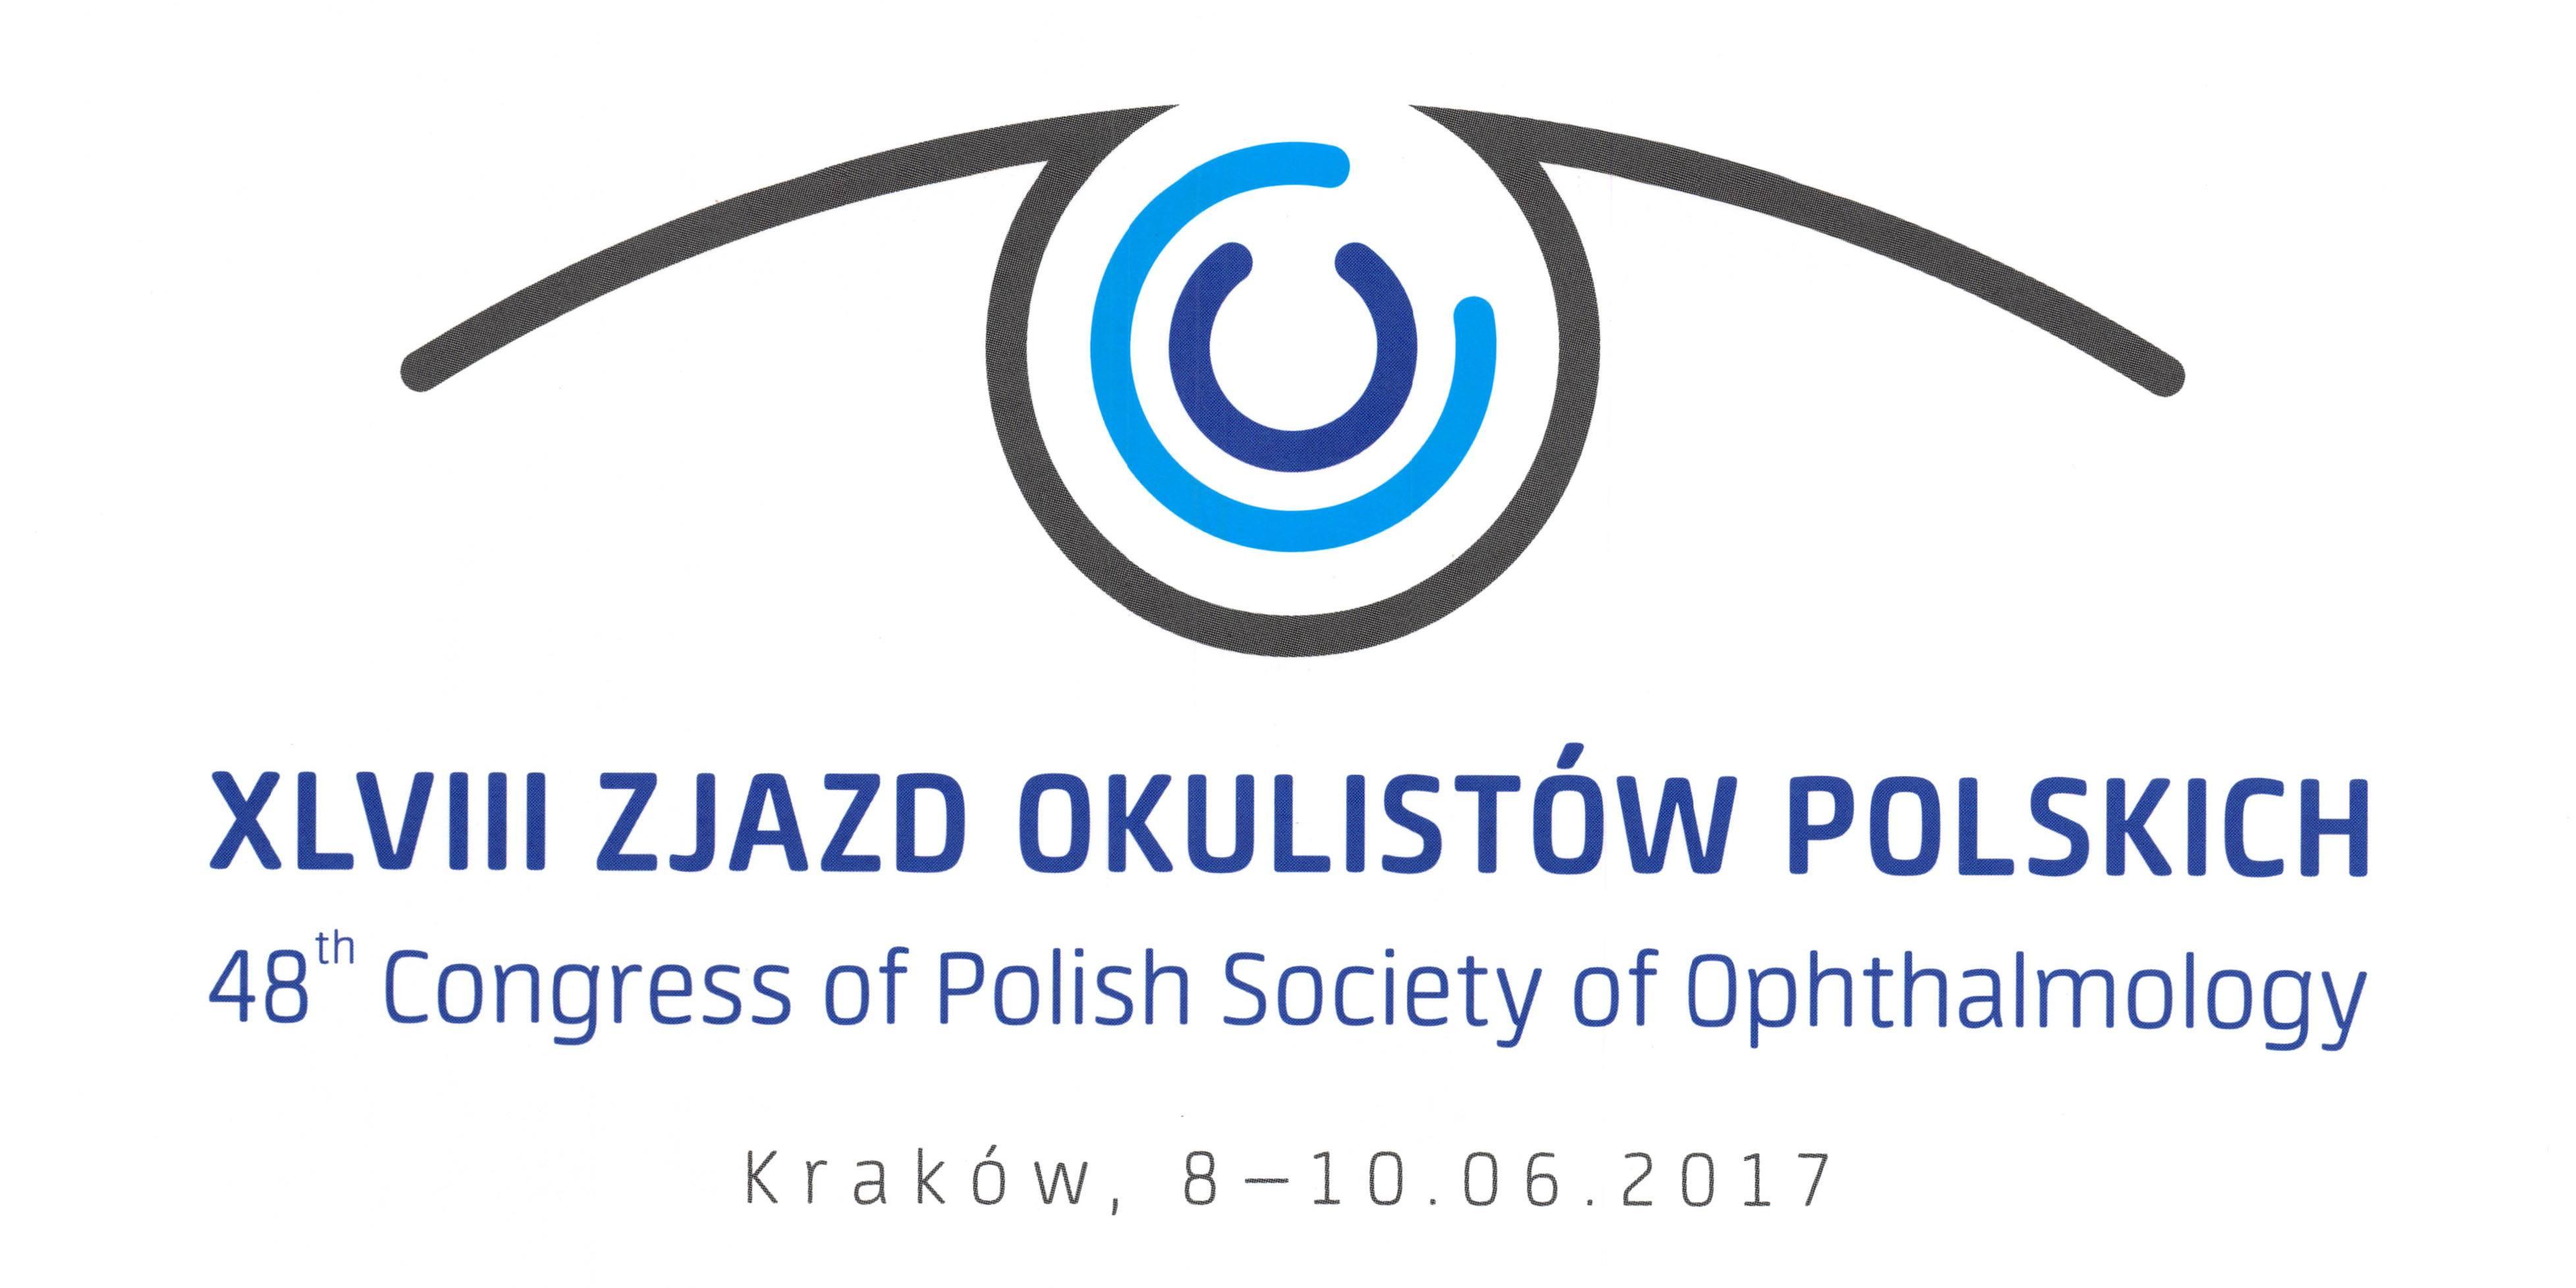 Polish Ophthalmological Society 2017